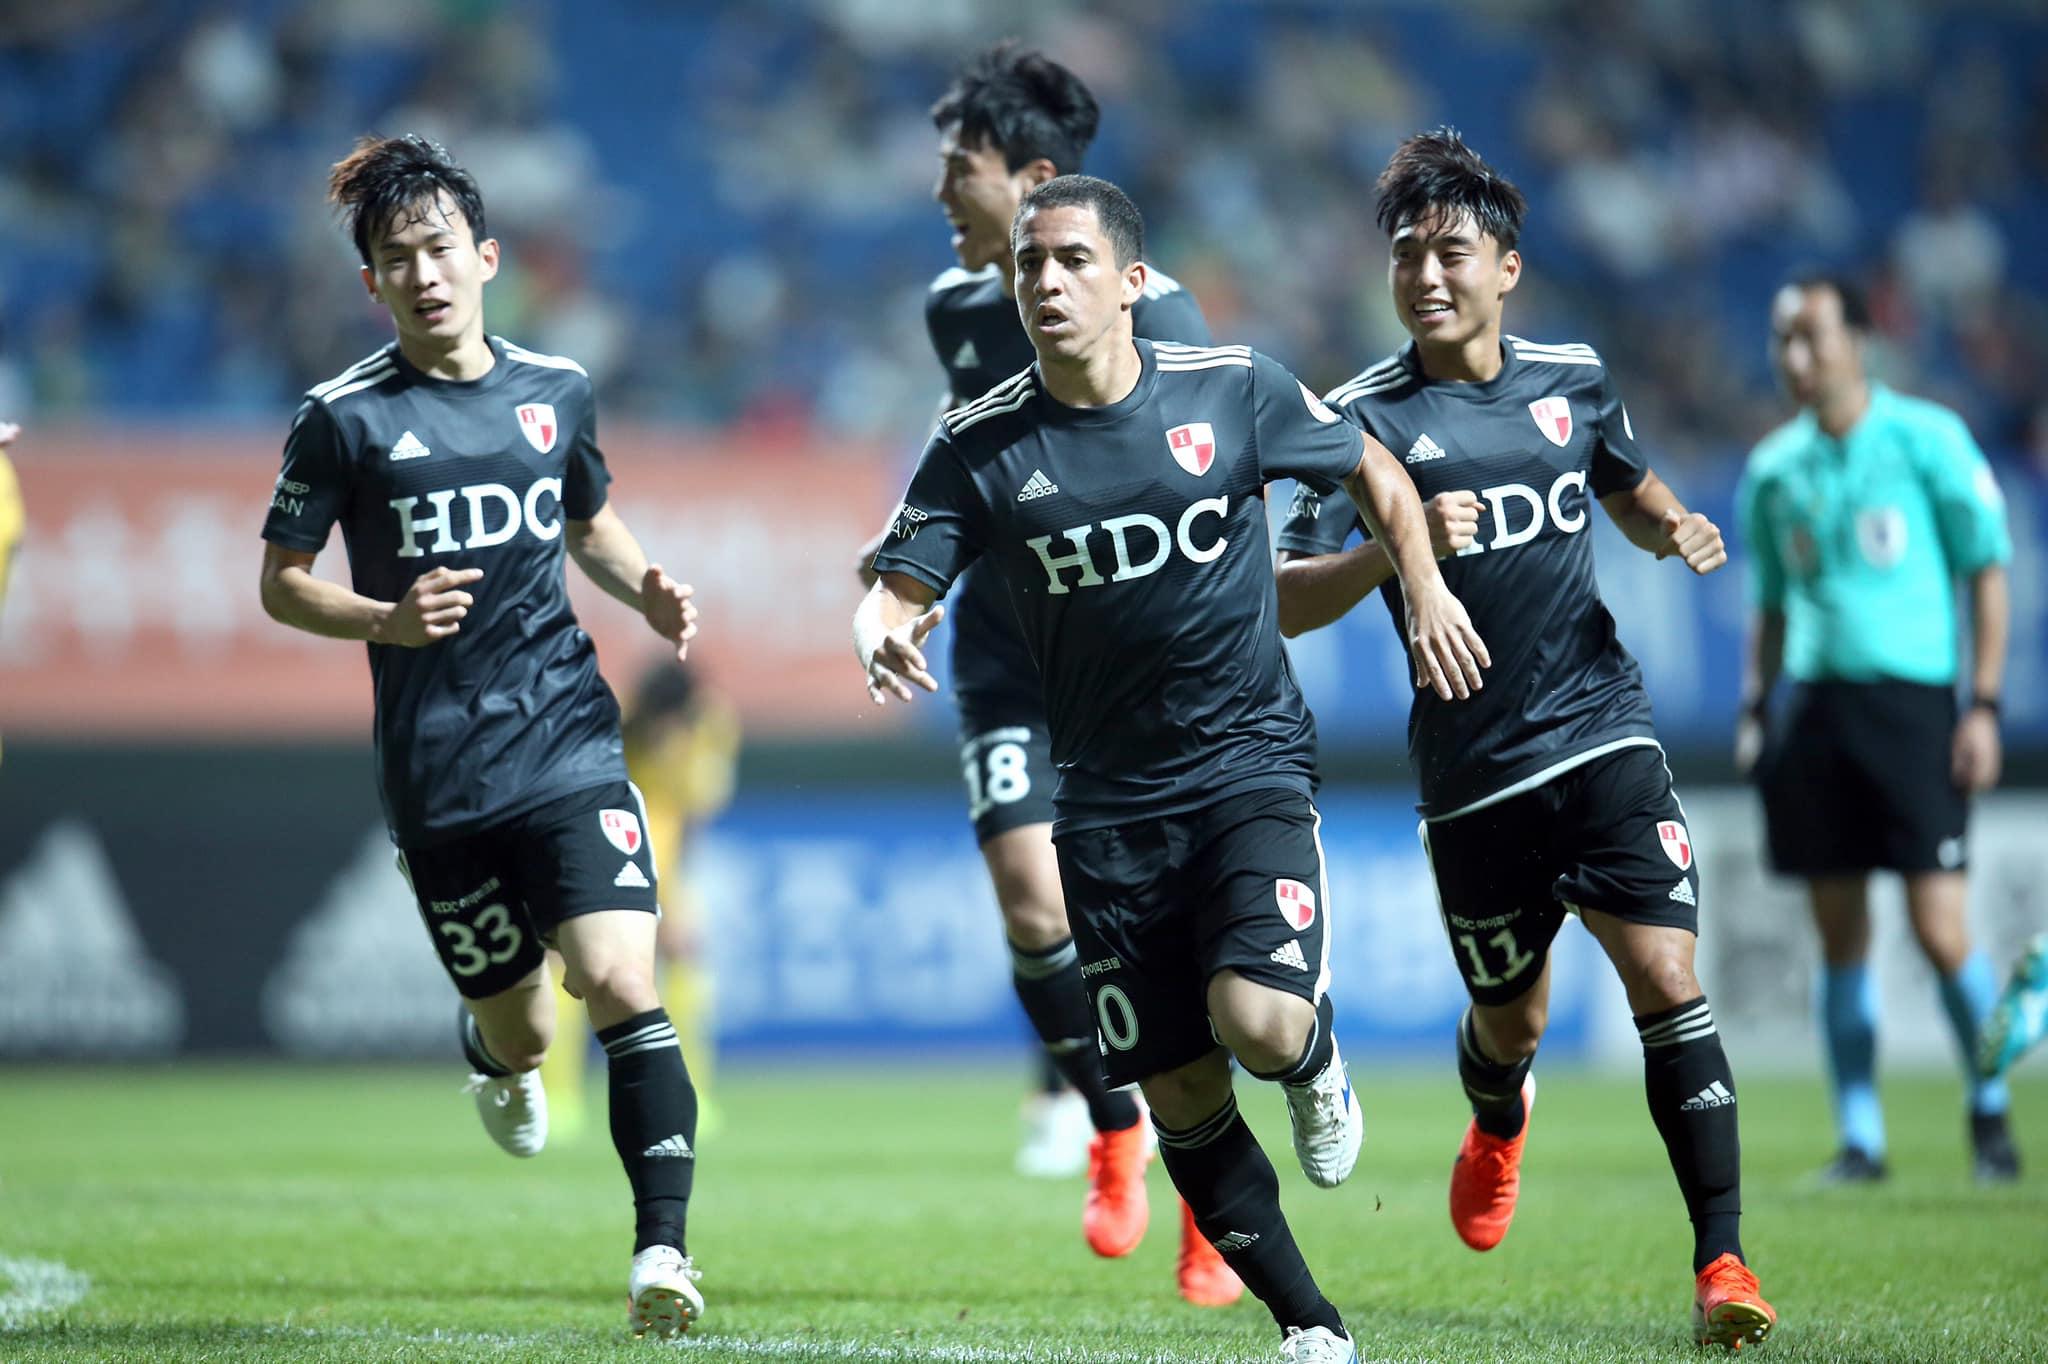 ex-bahia-espera-chegar-a-marca-historica-no-futebol-da-asia-Futebol-Latino-30-09